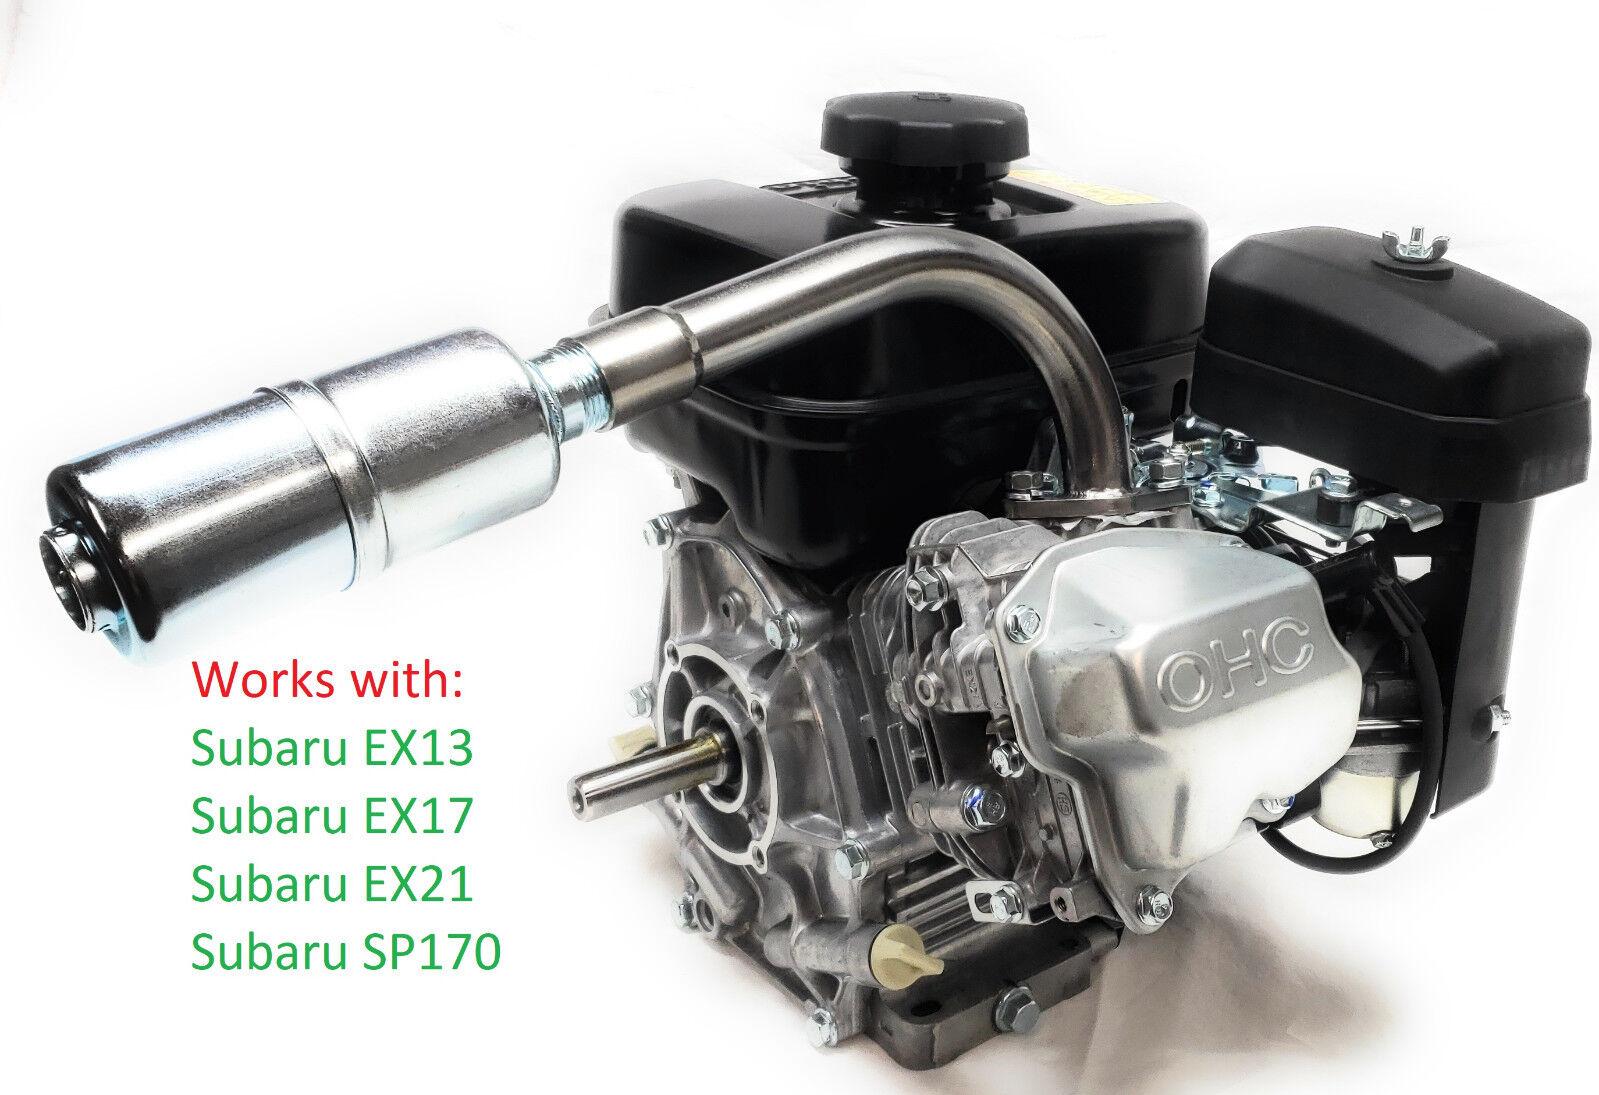 Exhaust With Muffler for Mud Motors  Subaru Robin EX13, EX17, EX21, EX27, SP170